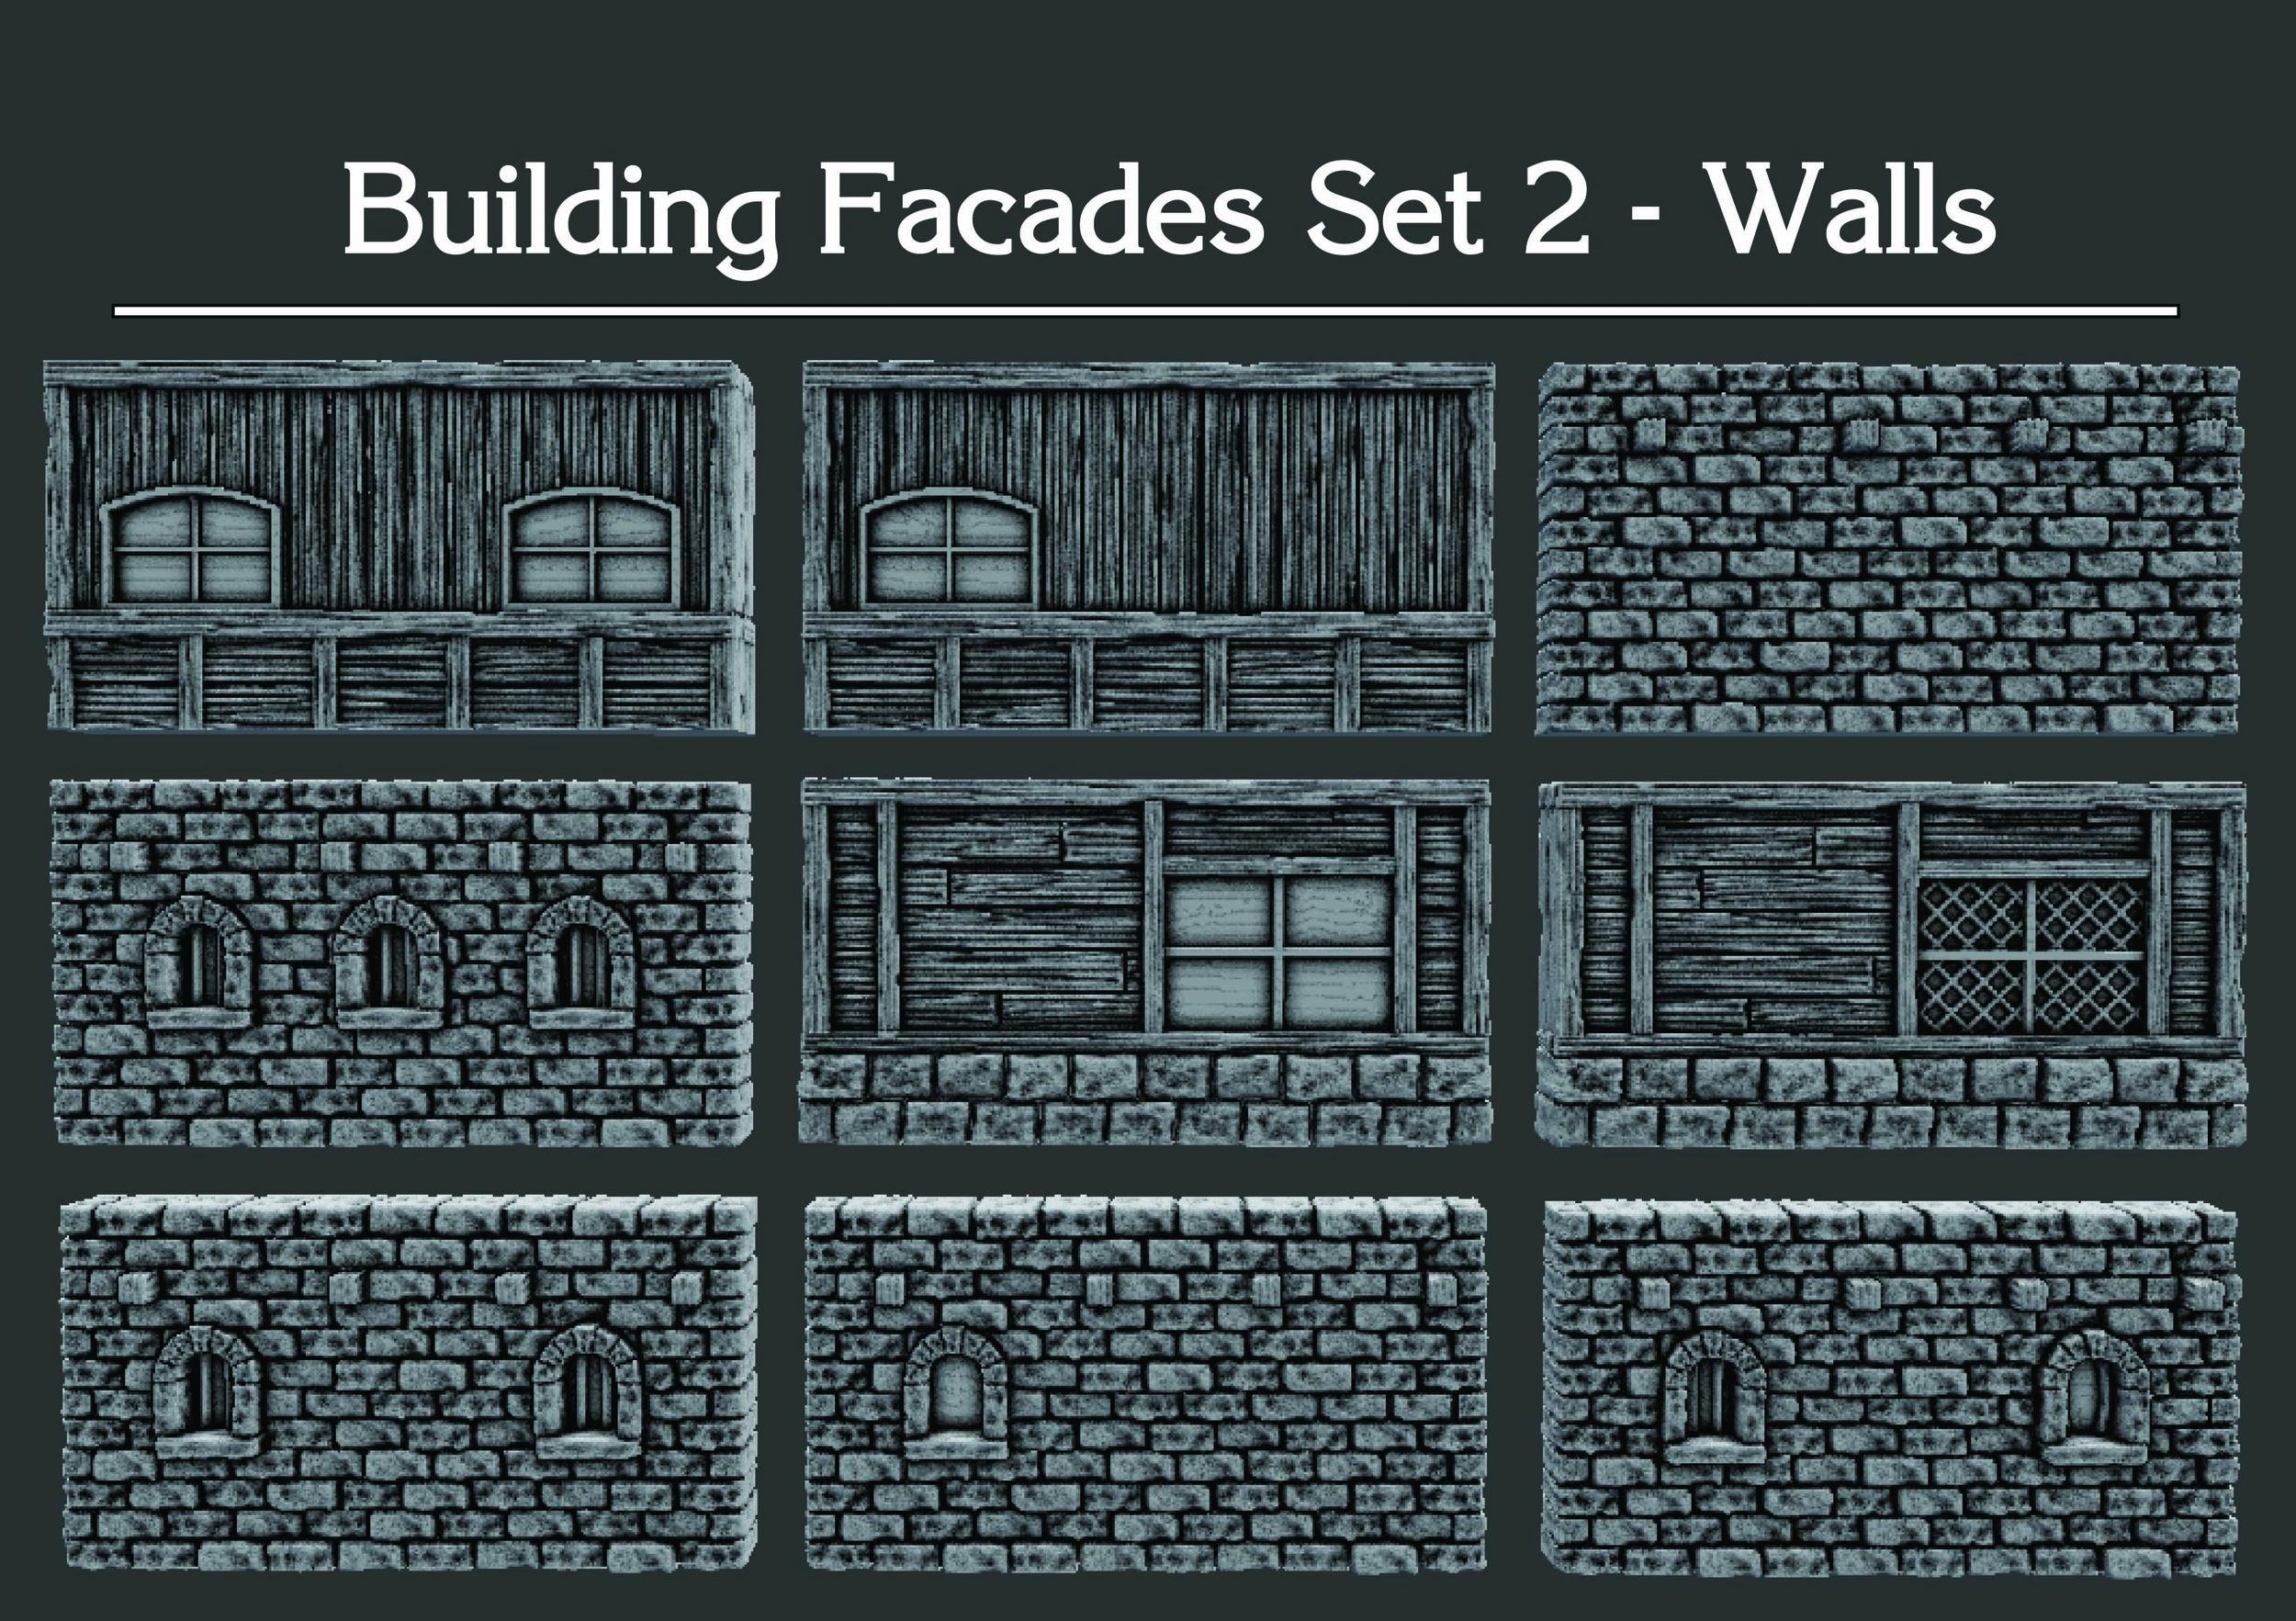 Building Facades Set 2 Walls 1.0.jpg